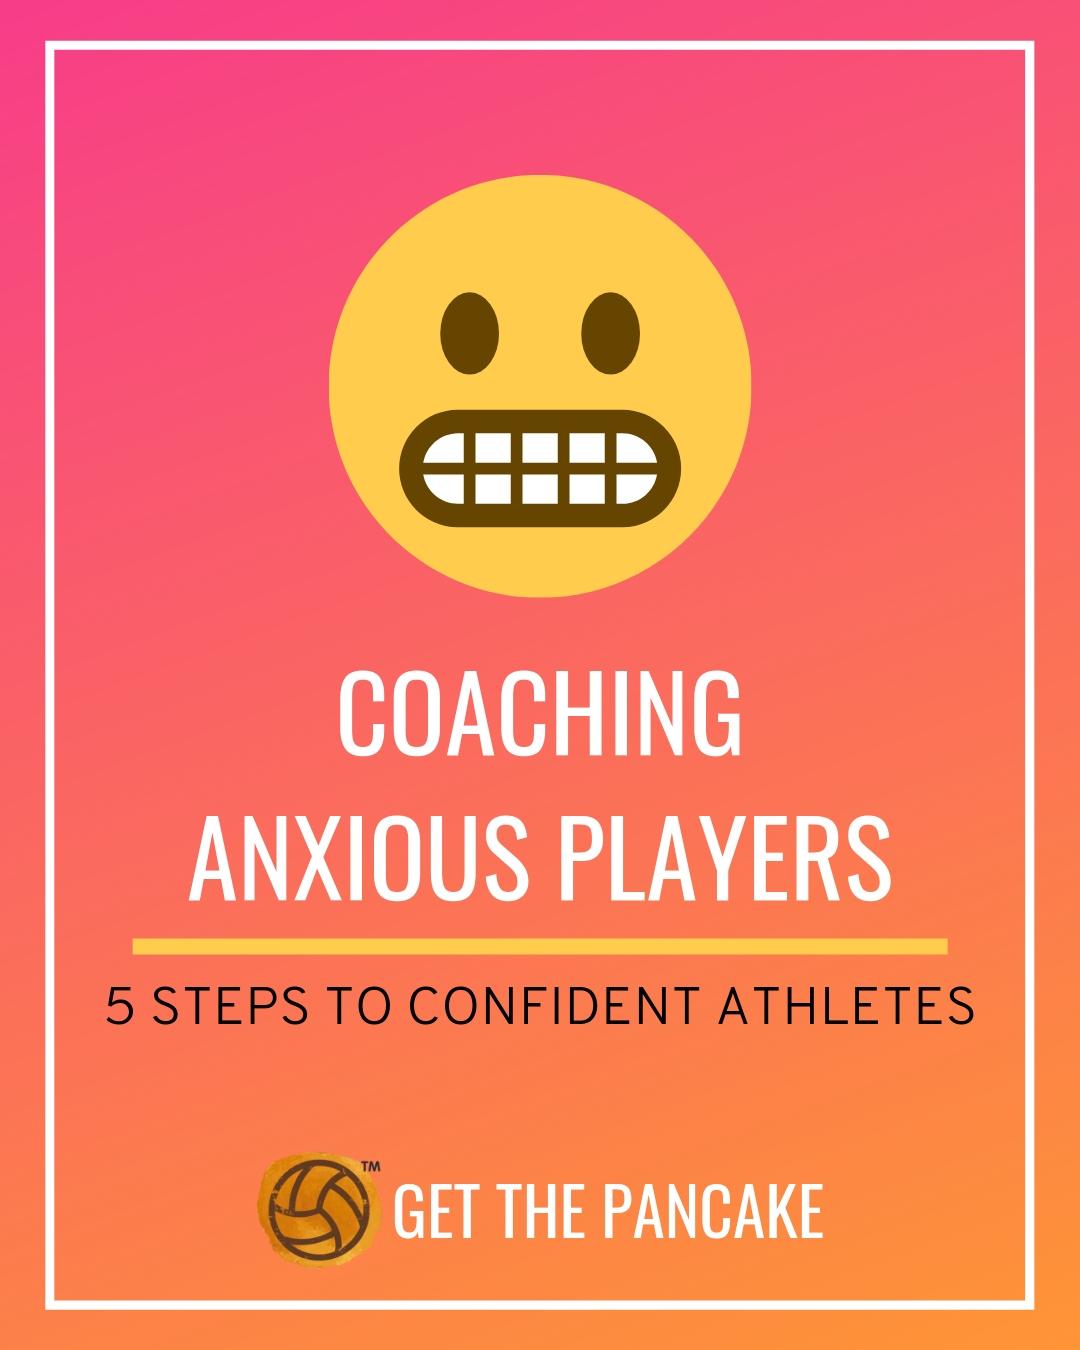 Coaching Anxious Players (1).jpg